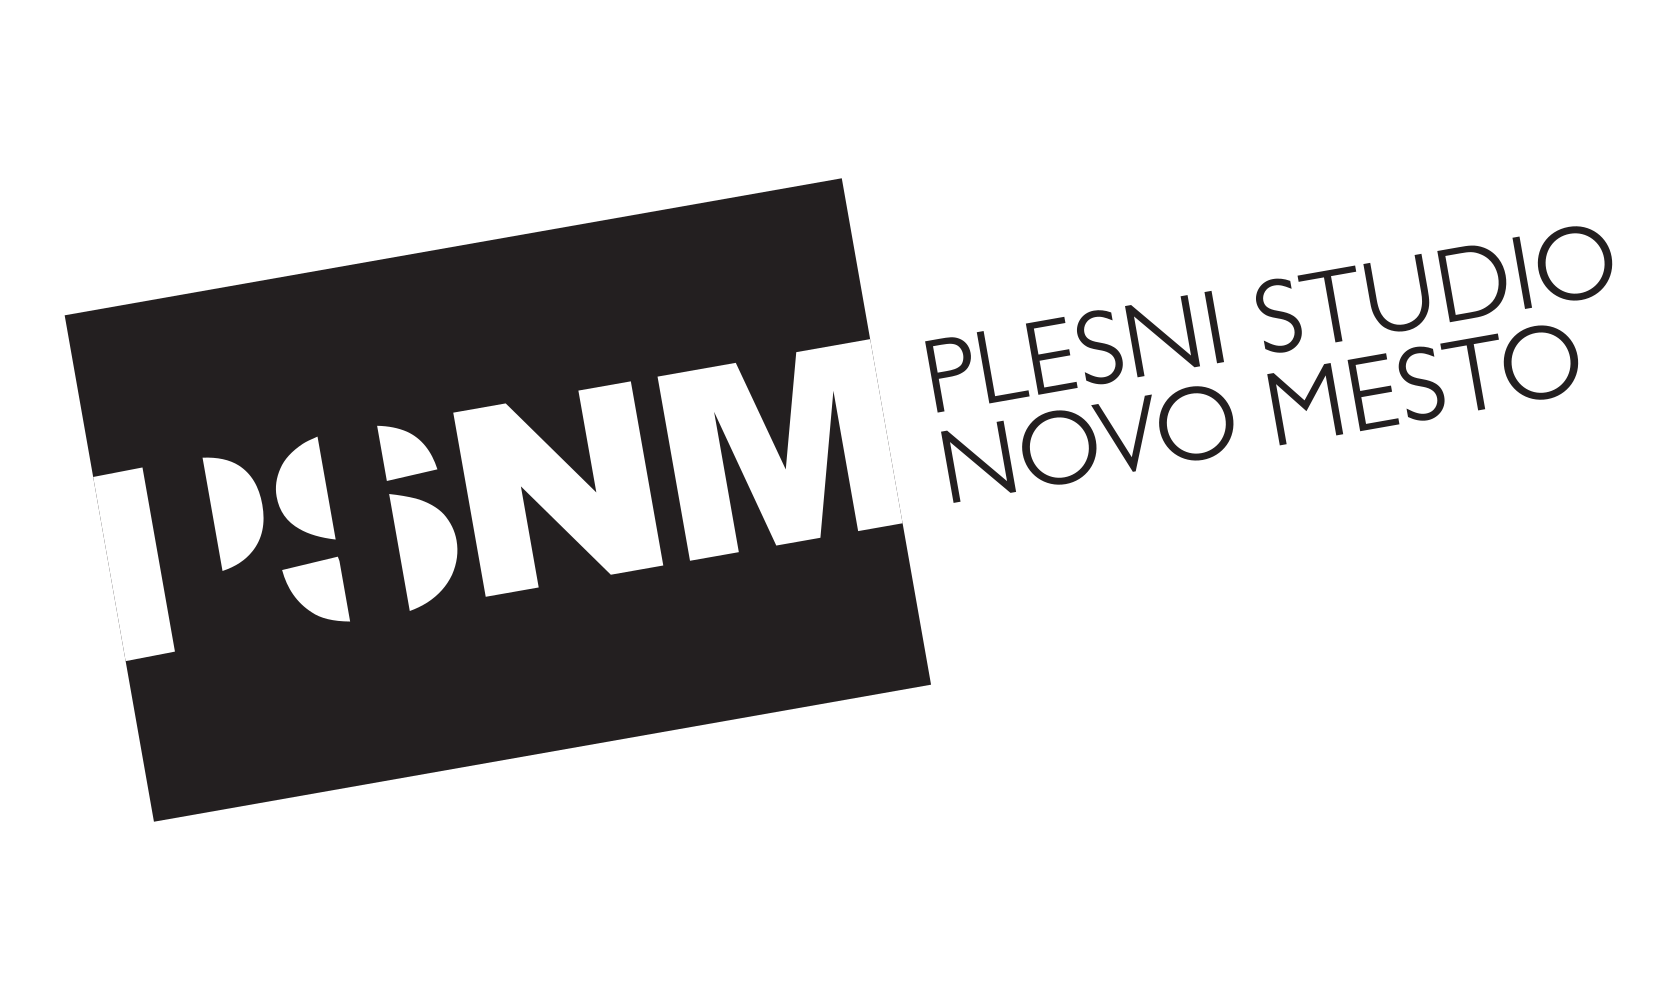 Plesni studio Novo mesto - logo